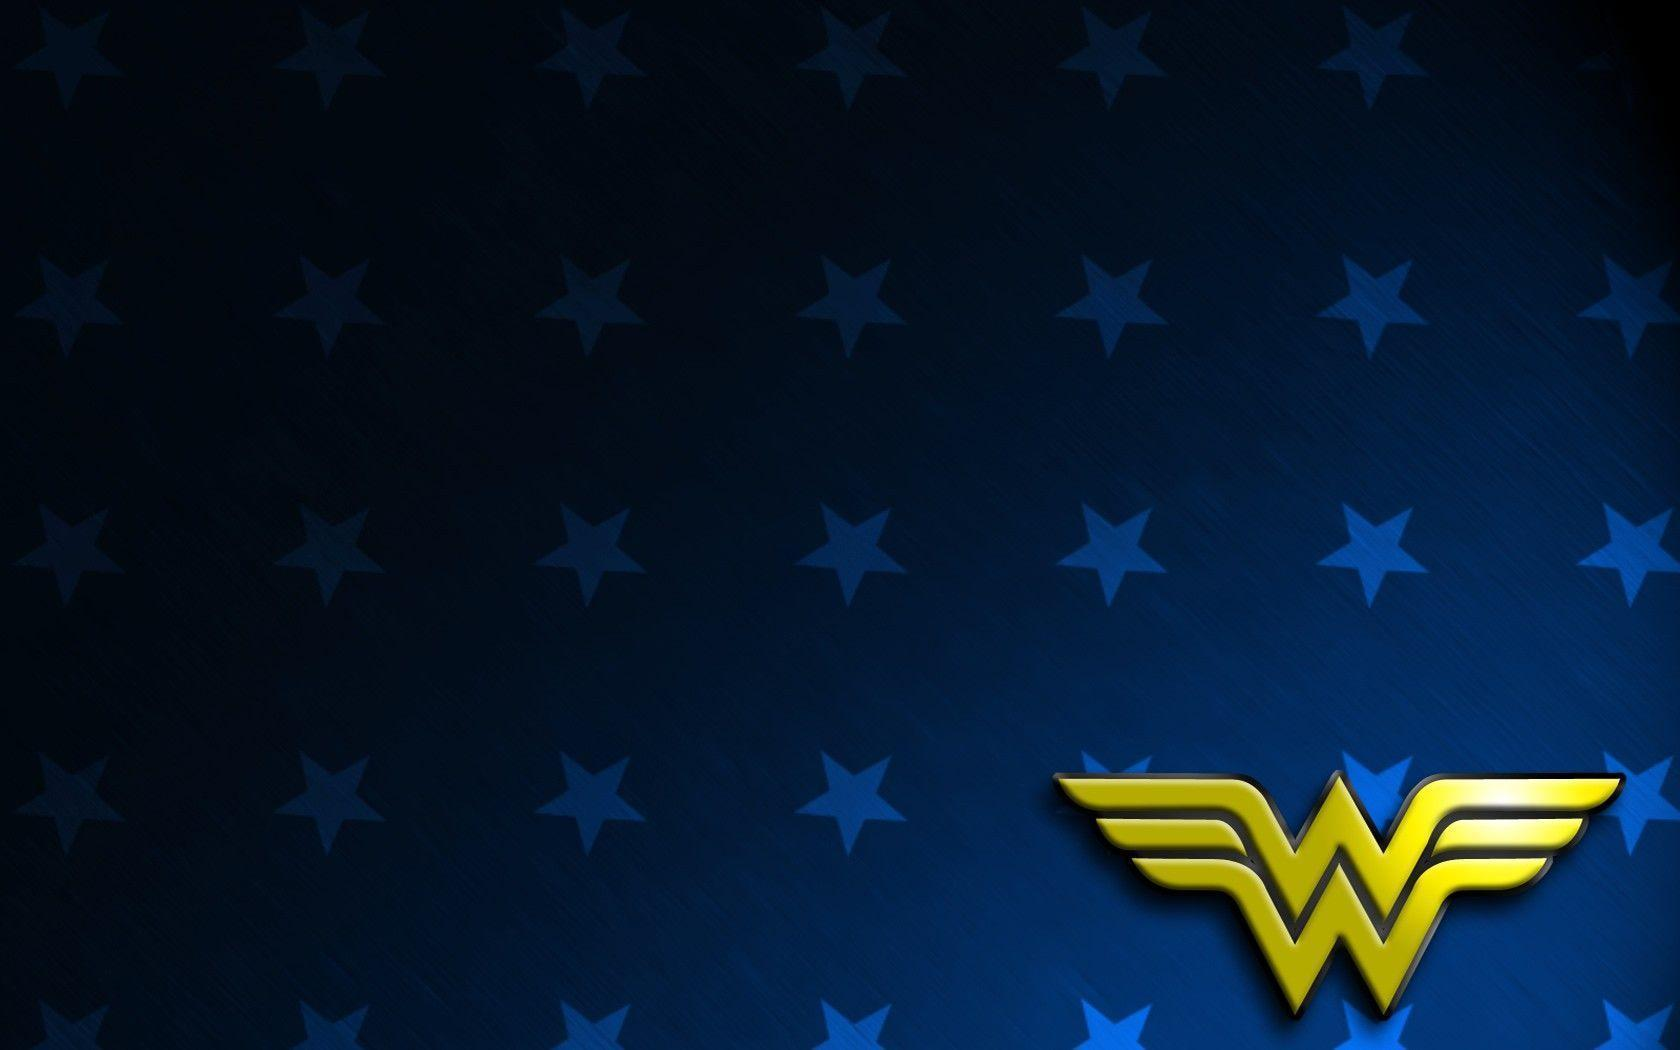 Wonder Woman wallpaper | DC Comics wallpapers